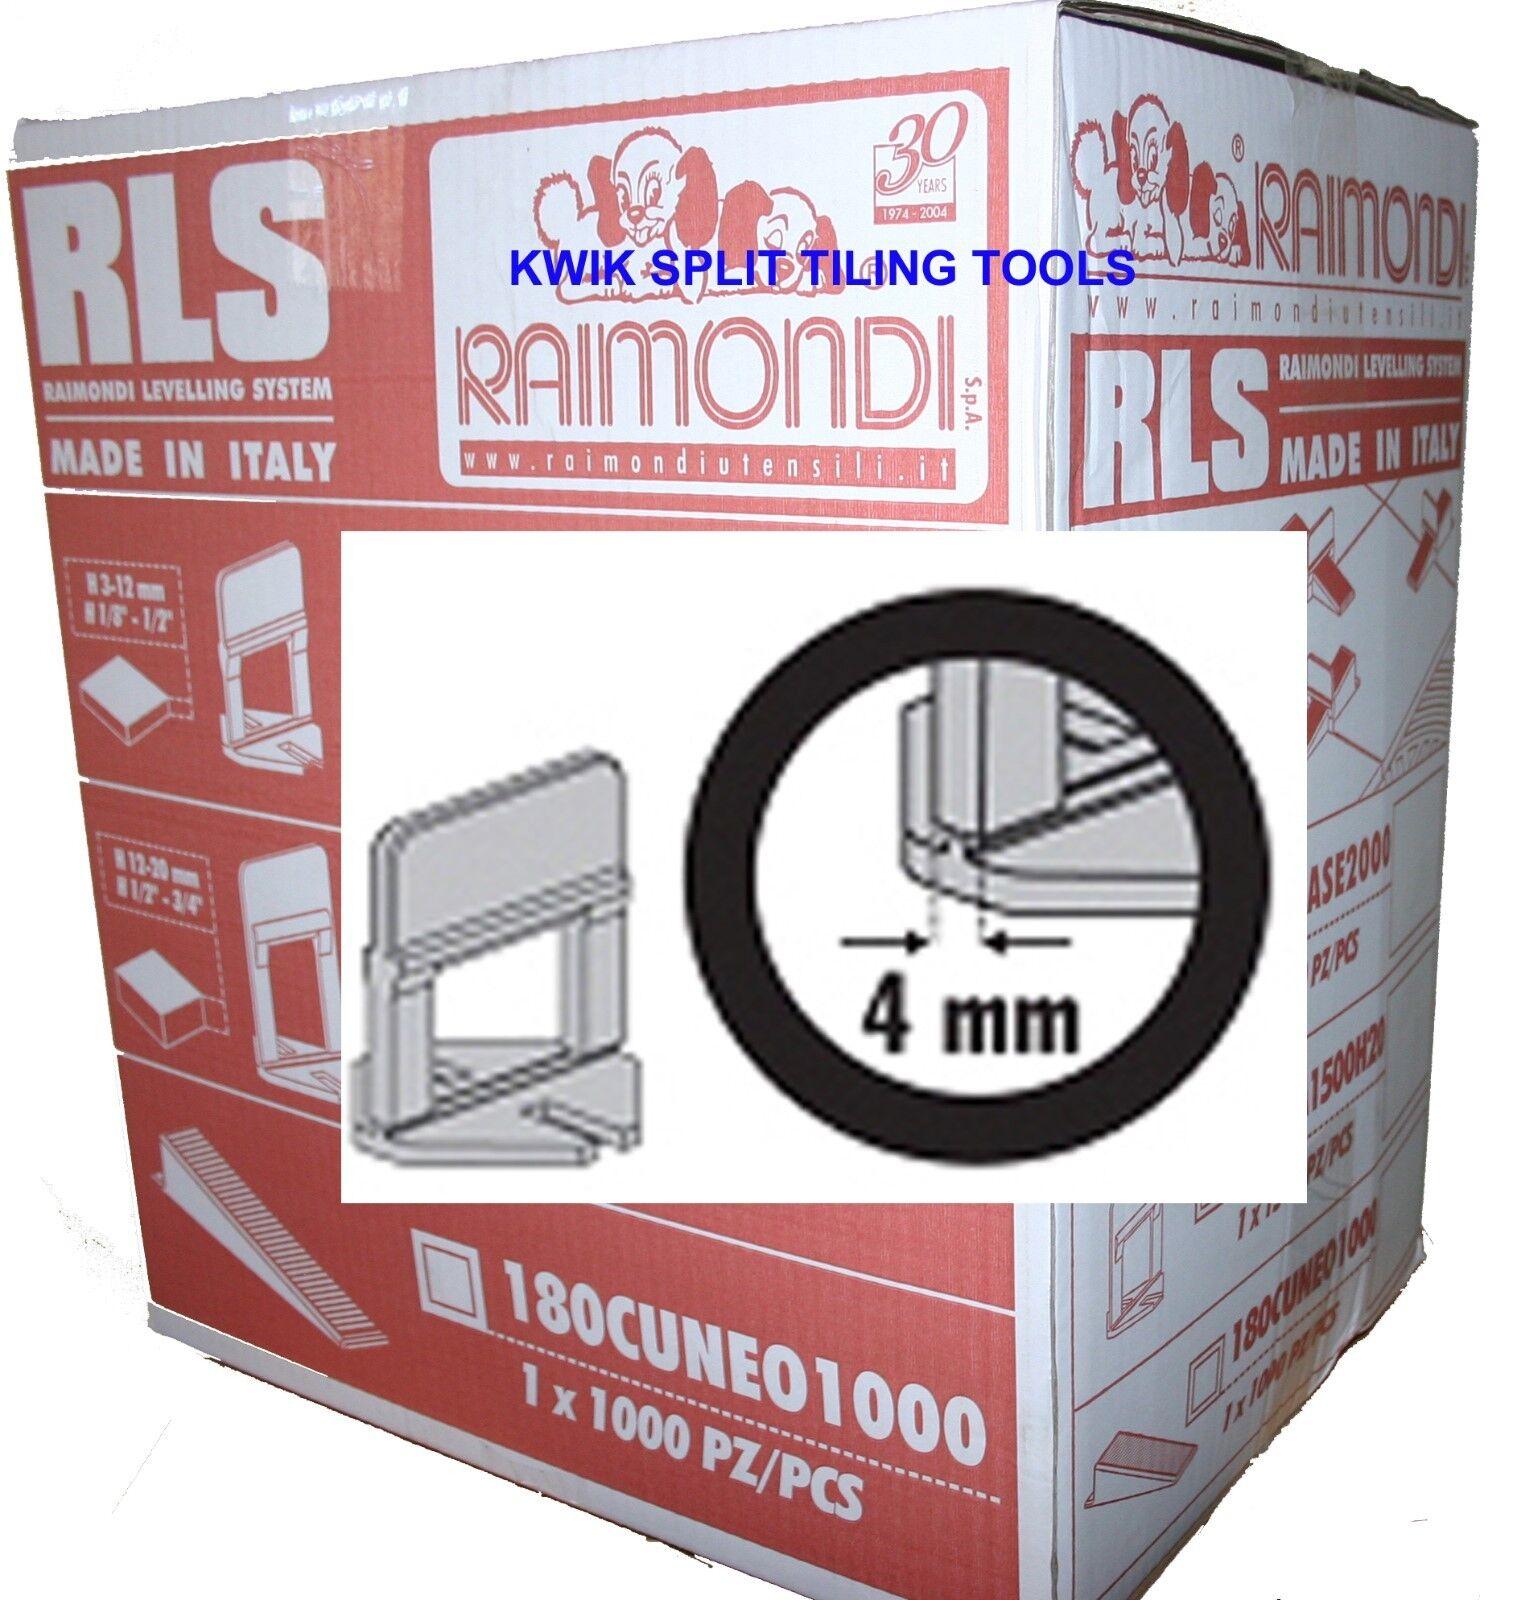 RAIMONDI TILE LEVELLING SYSTEM BASE CLIPS 4mm WIDE